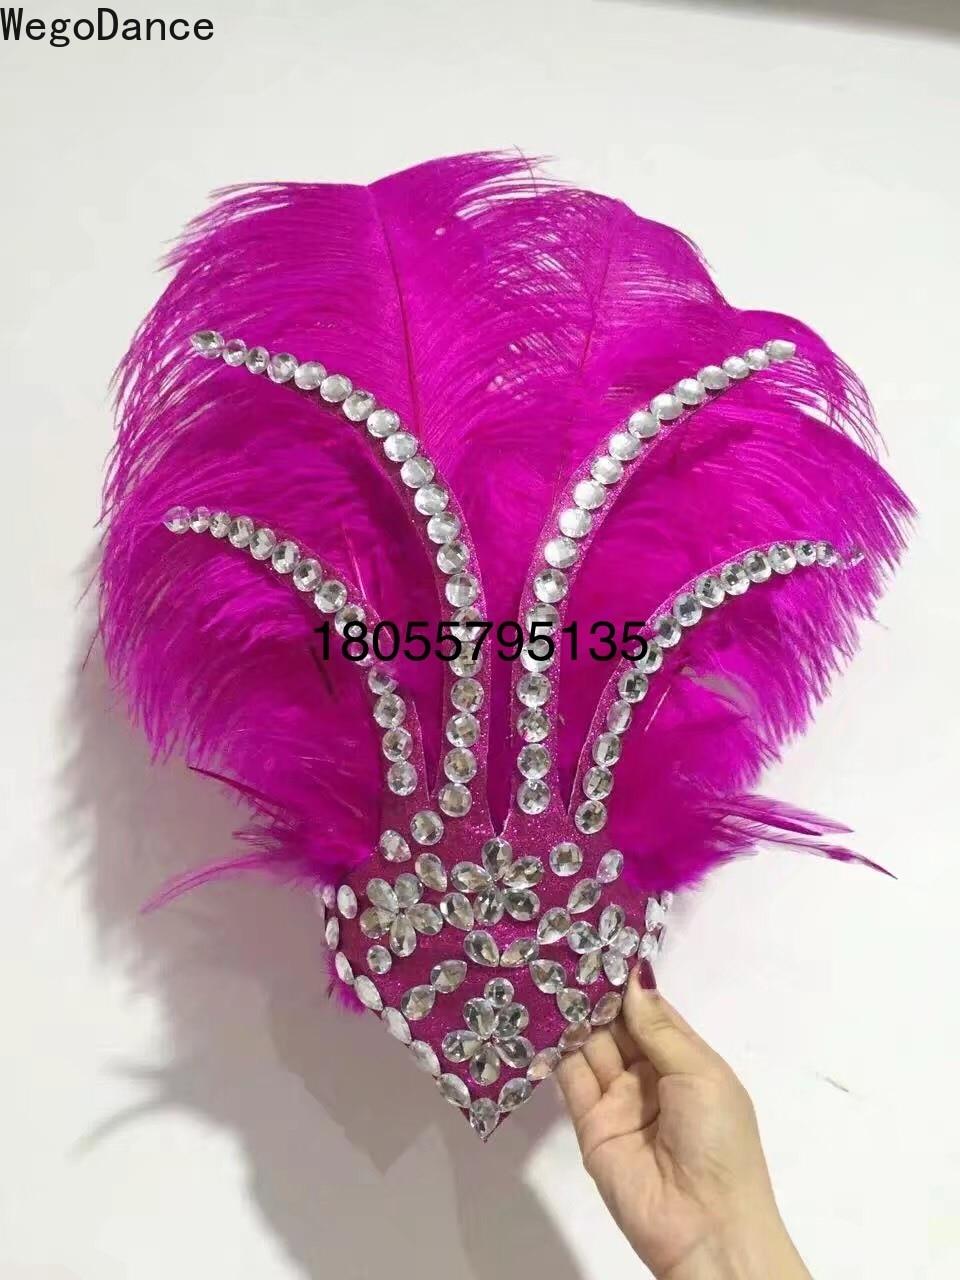 Samba Dance Headdress Ostrich Hair Opening Show Costumes Big Feather Headwear For Women